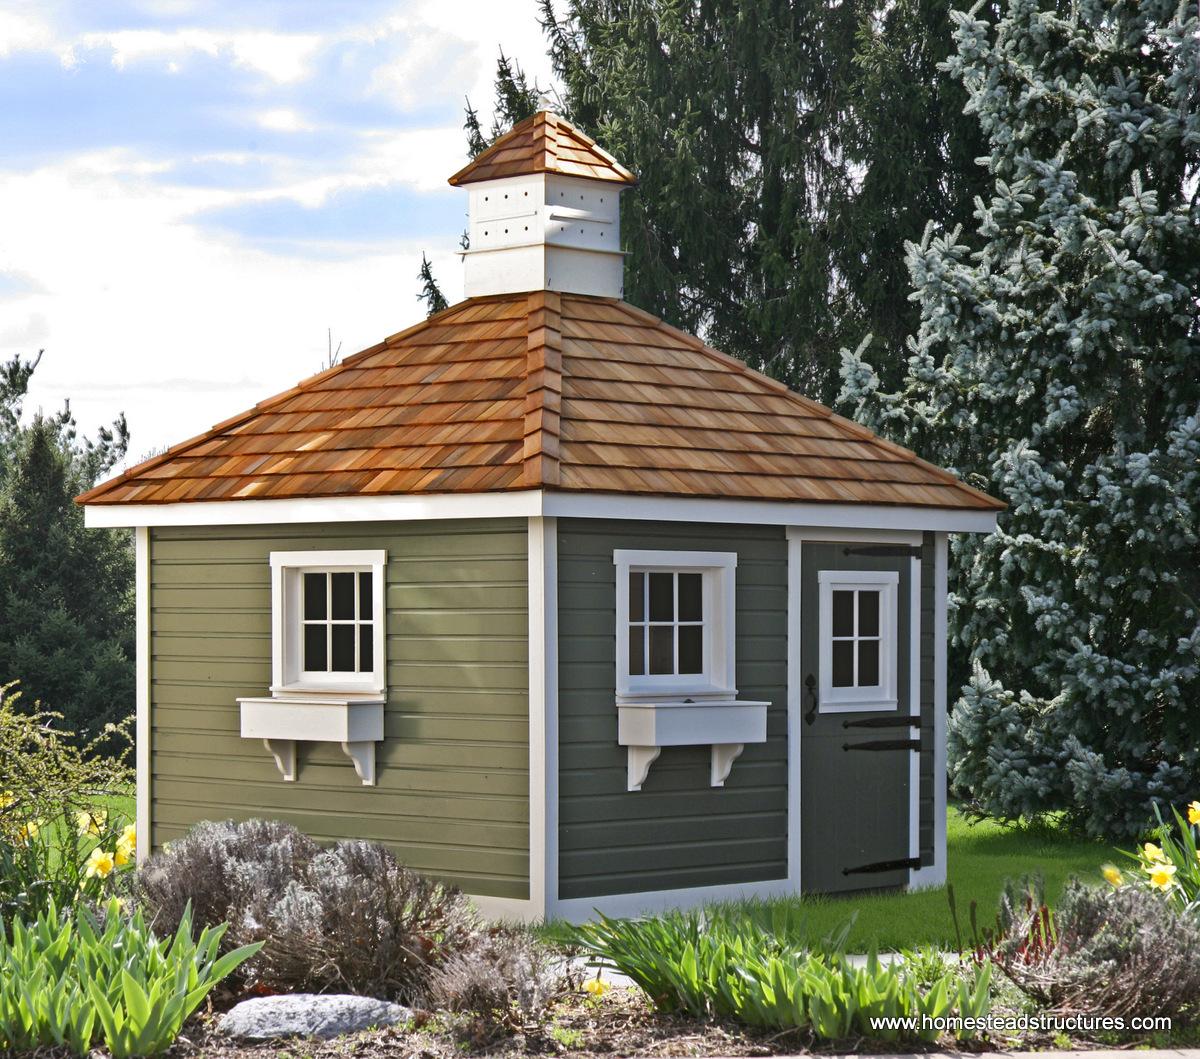 Premier Garden Sheds For Garden Storage Homestead Structures